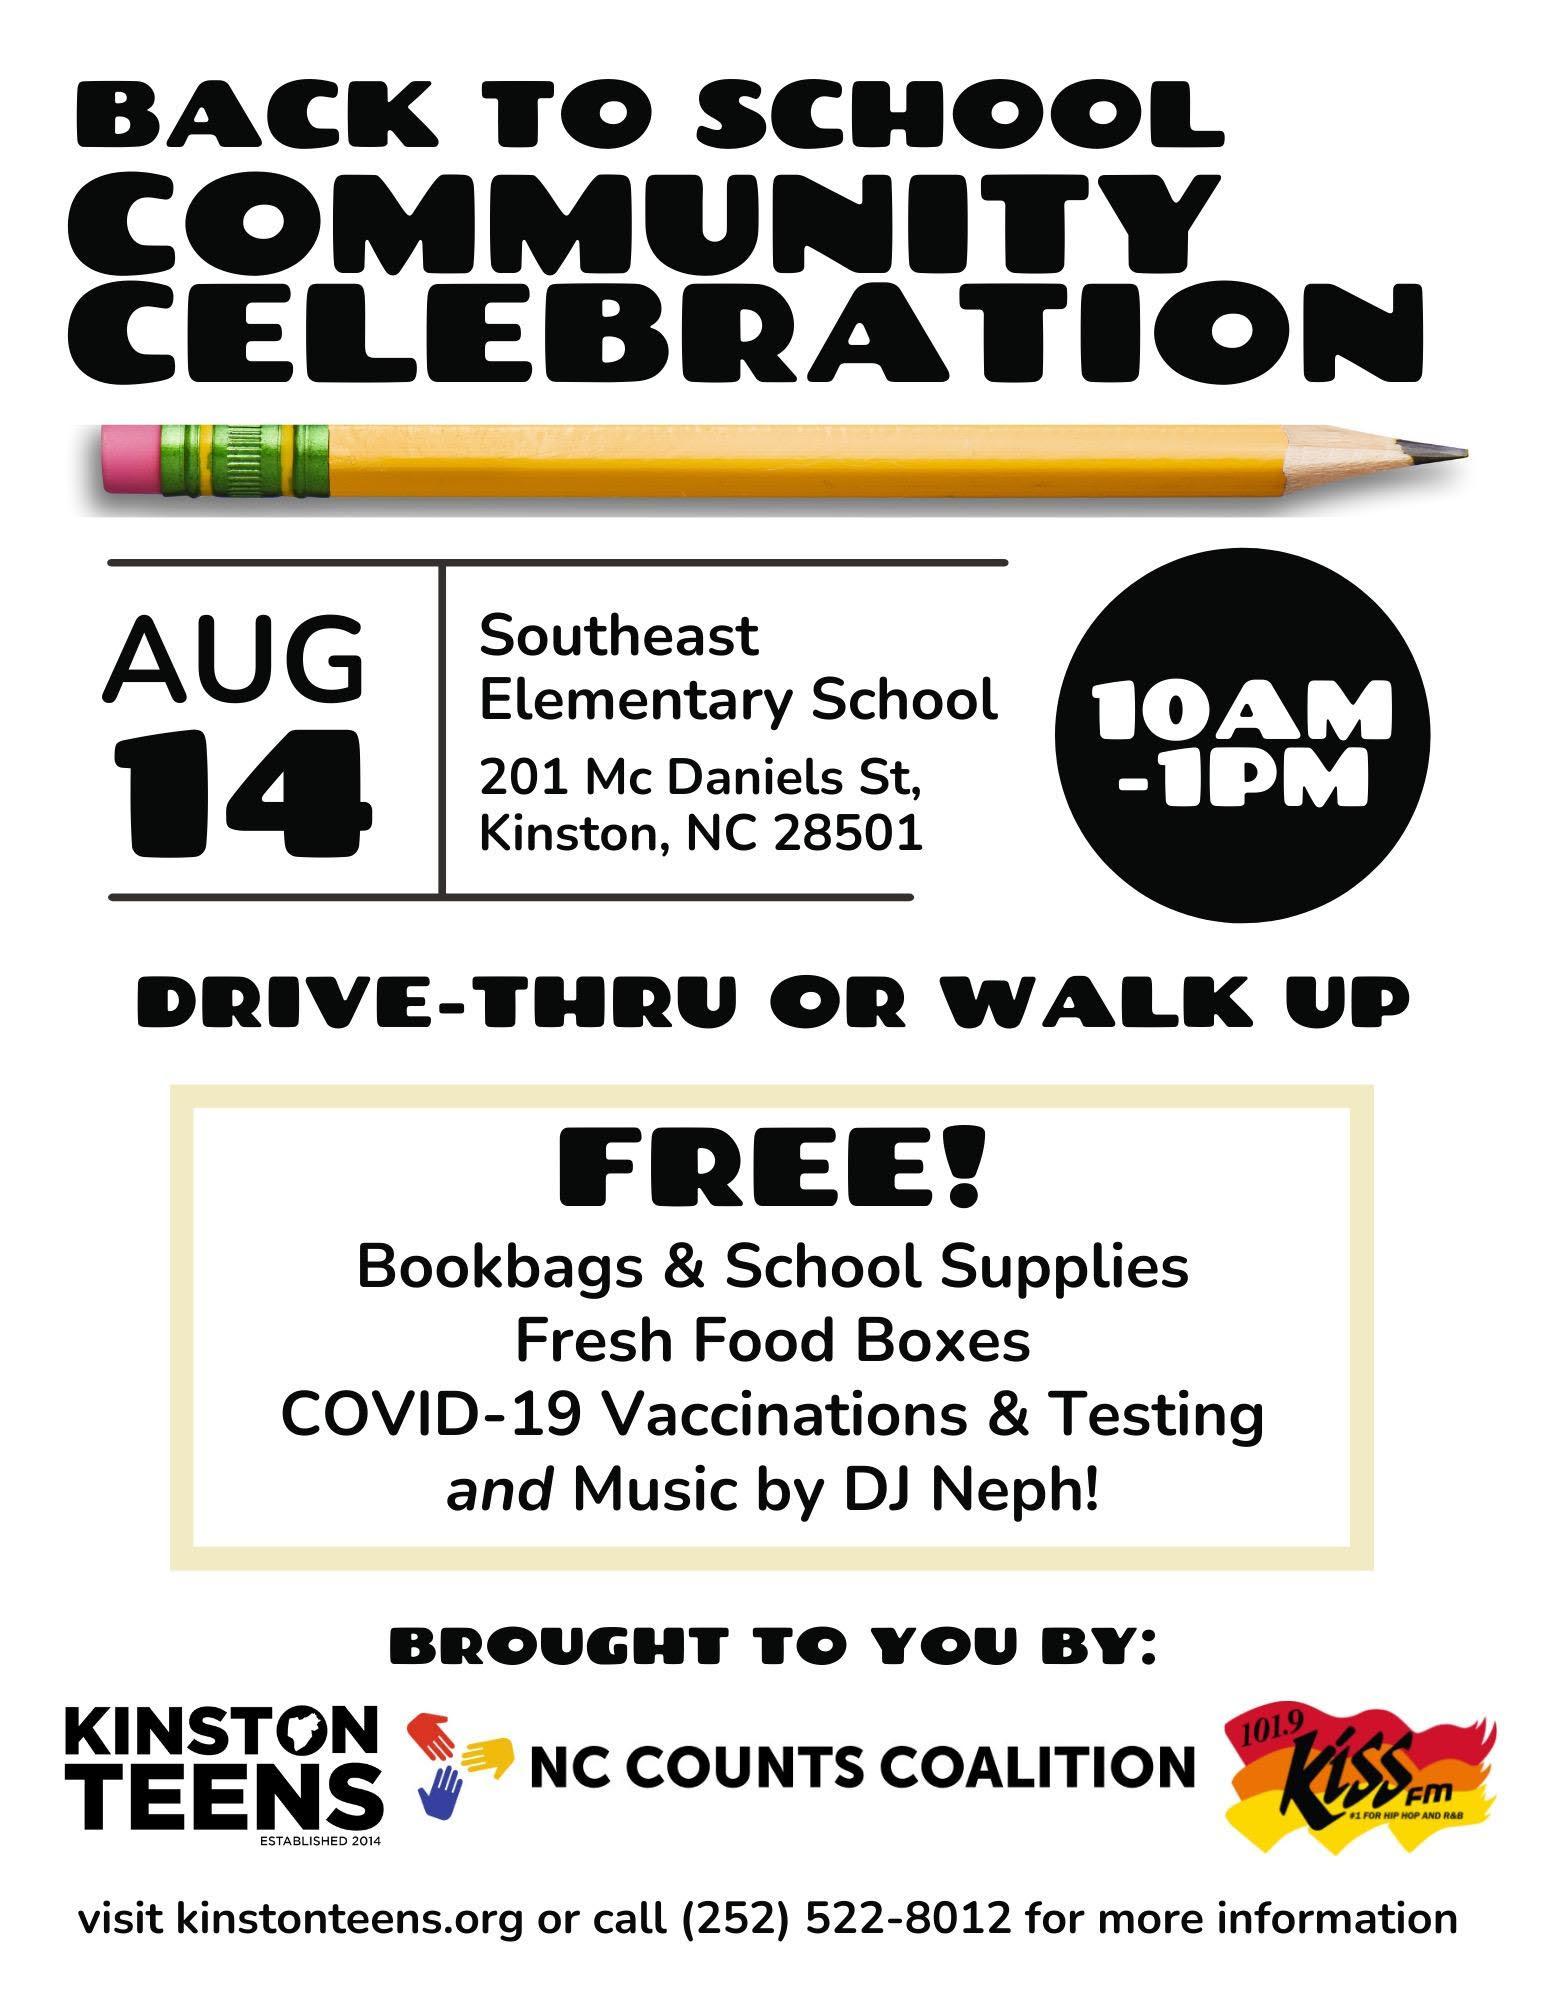 Back to School Community Celebration August 14 in Kinston at Southeast Elementary School